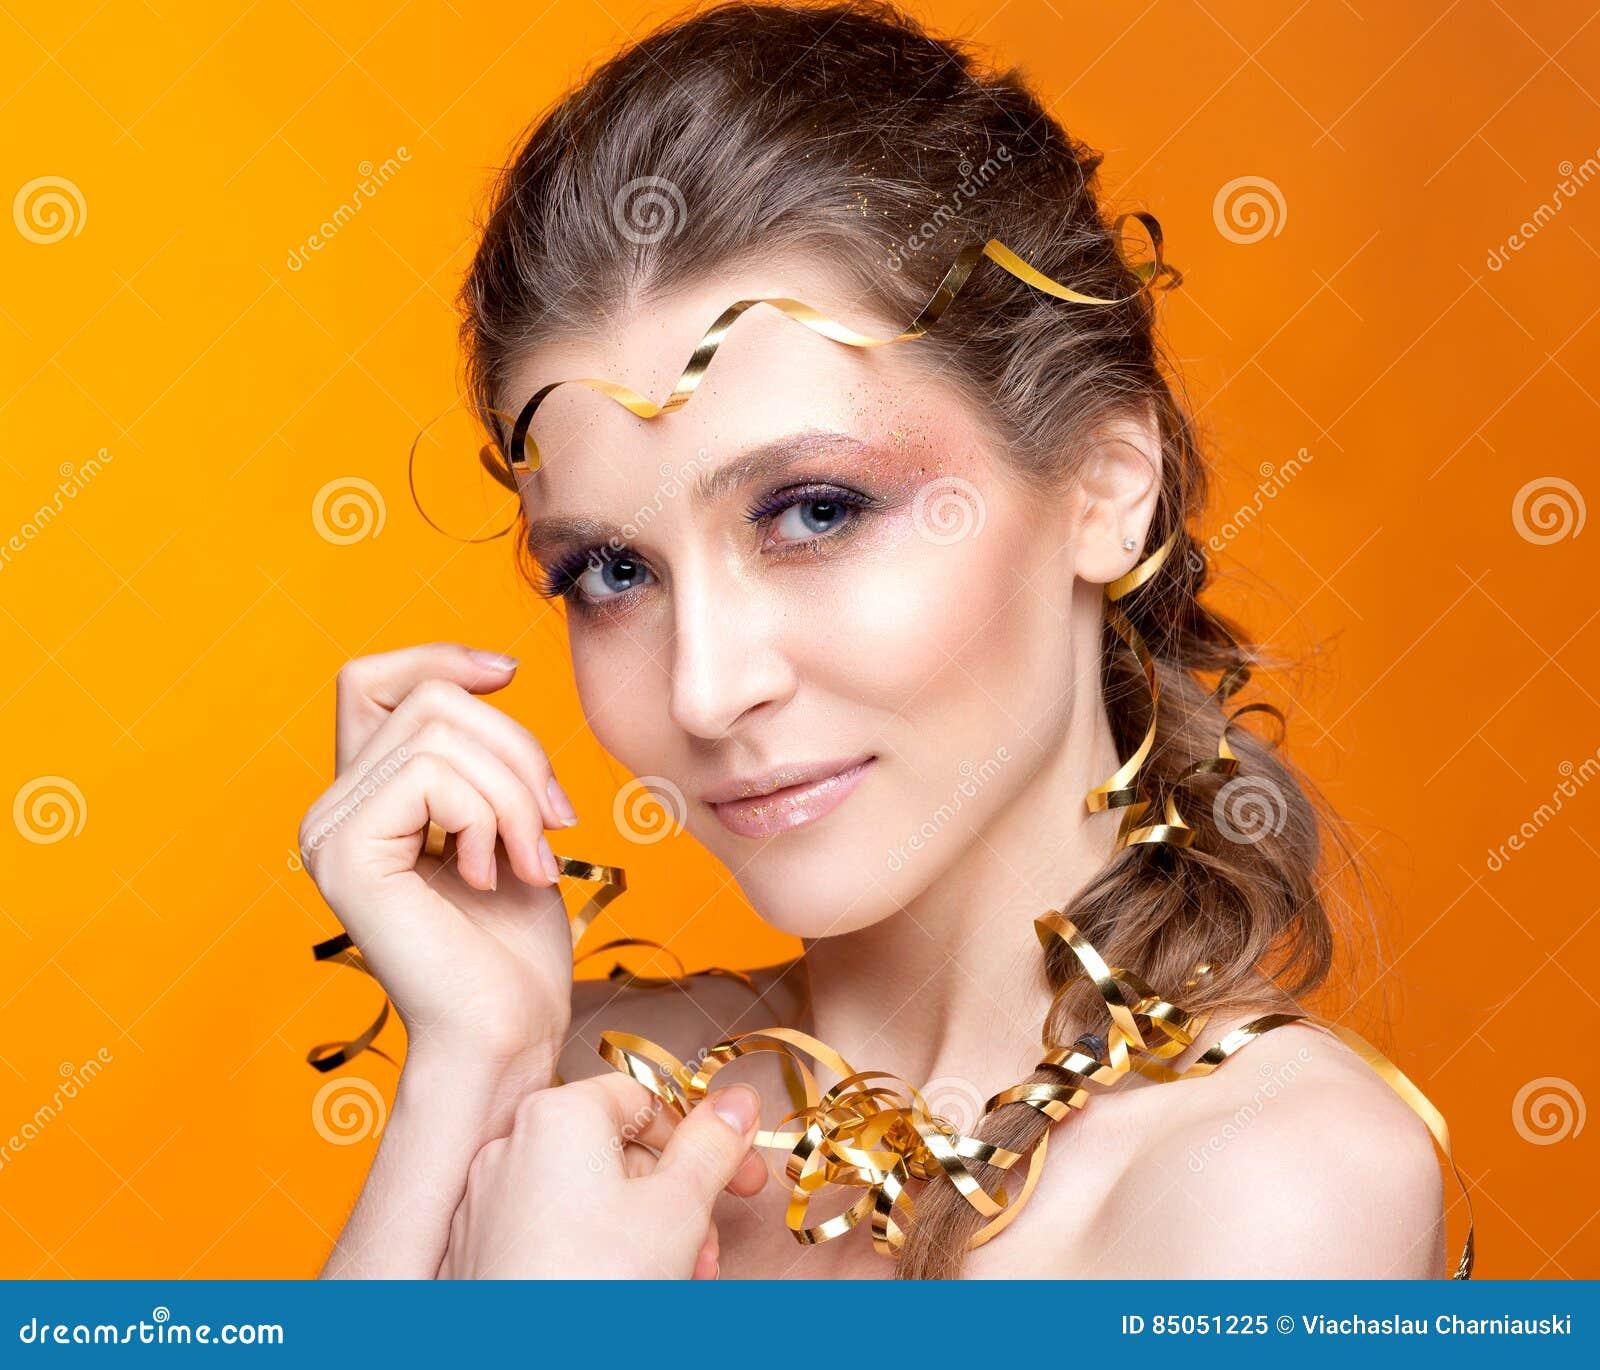 Portrait of a beautiful woman on an orange background.